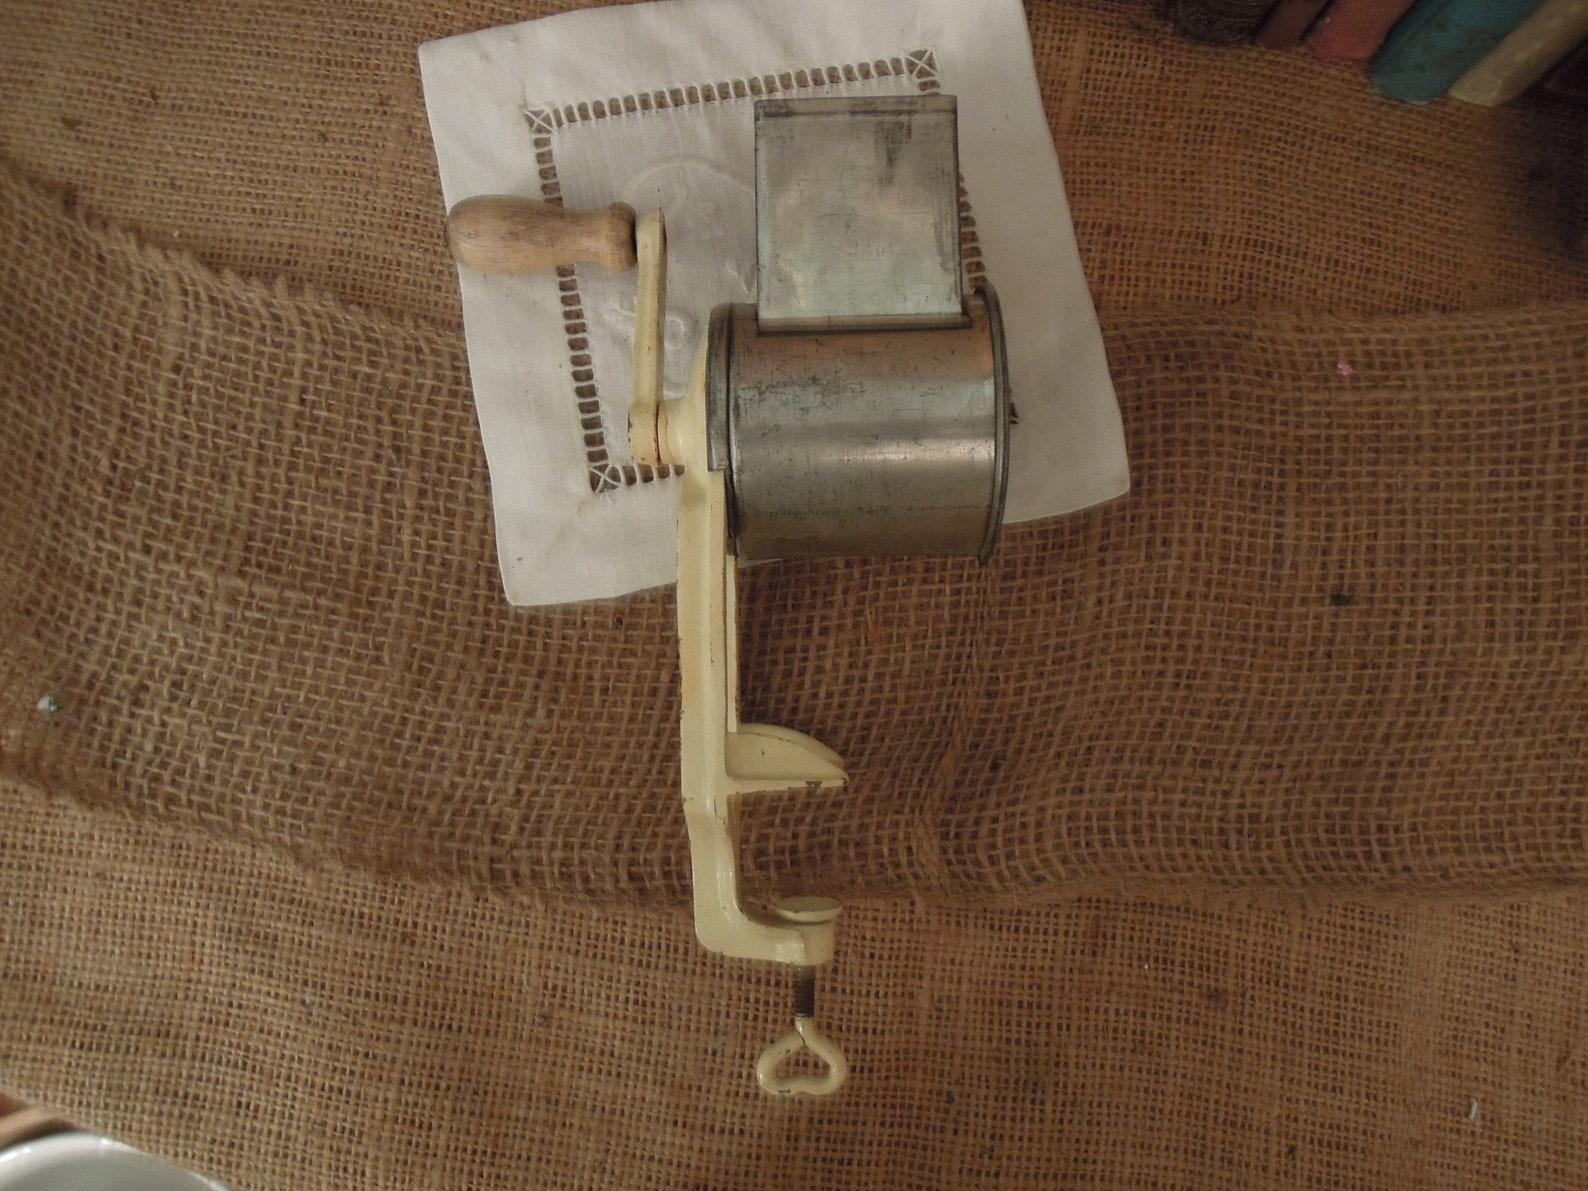 Antique German Counter Top Grinder / Vintage Iron & Tin Clamp Grinder / Hand Grater Cheese Coconut Hazelnut Almonds